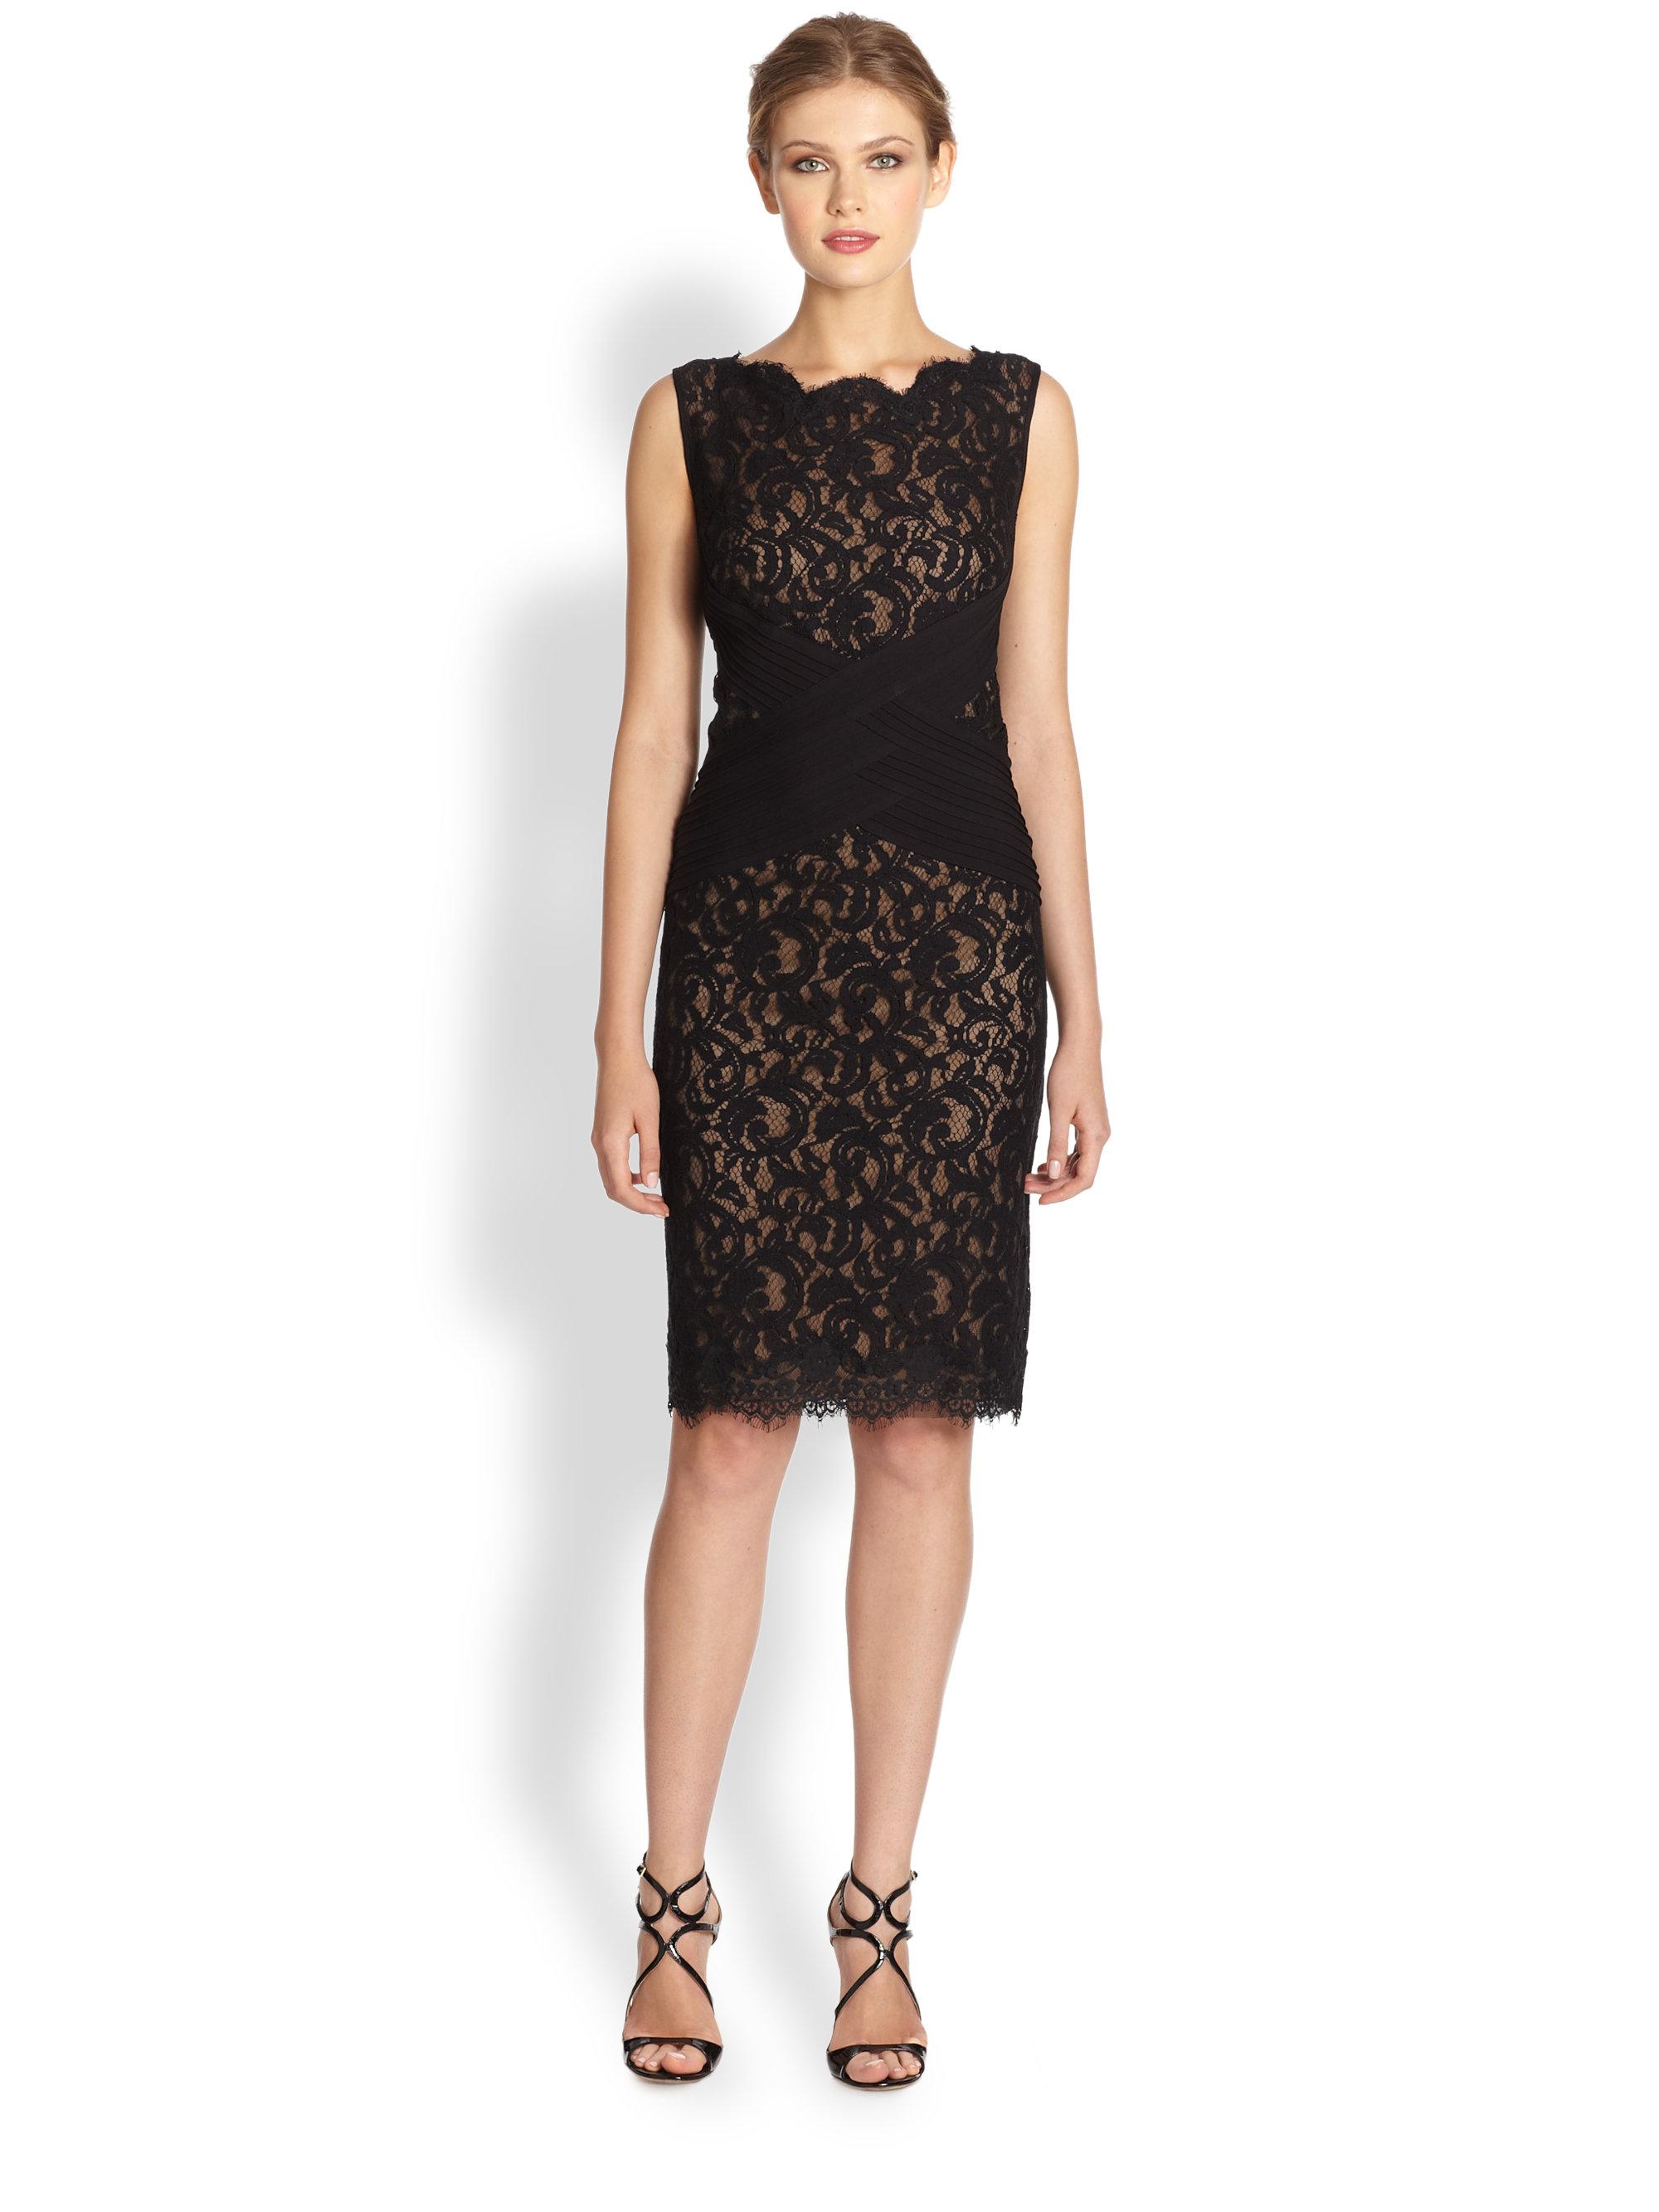 Tadashi Black Cocktail Dress